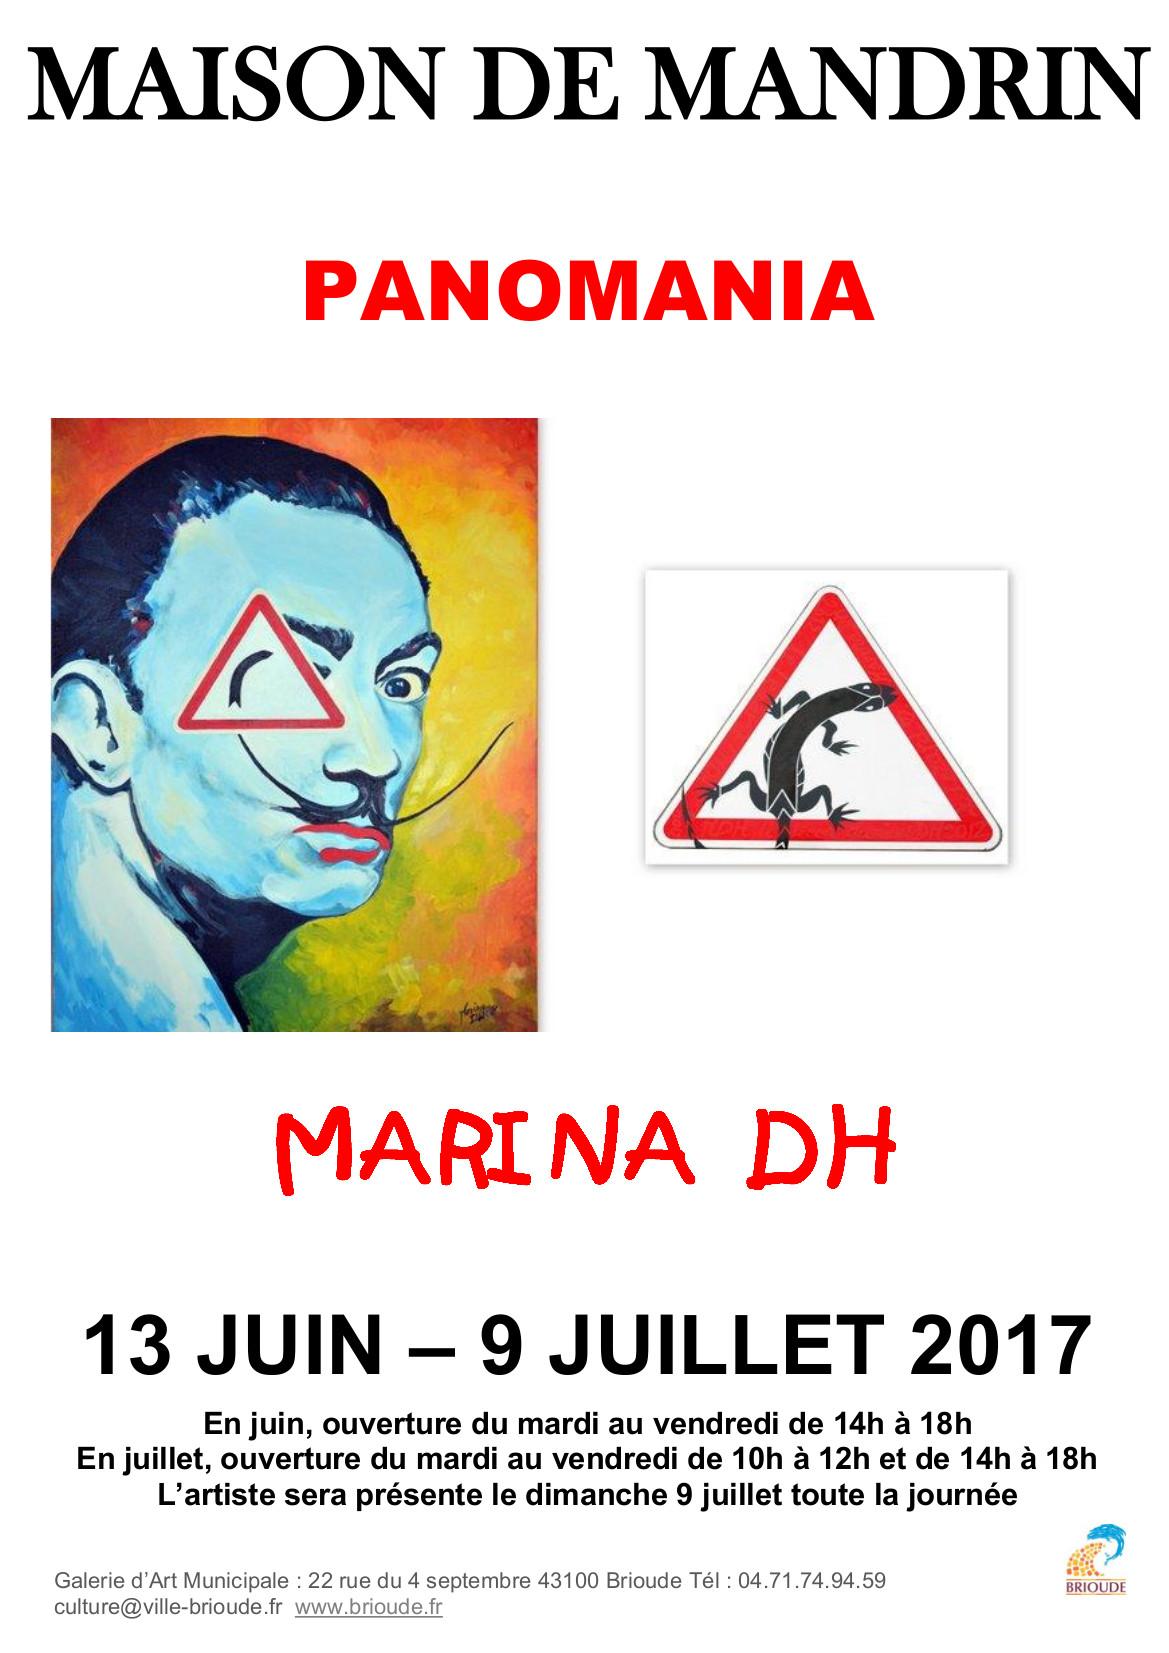 EXPOSITION MAISON DE MANDRIN : PANOMANIA